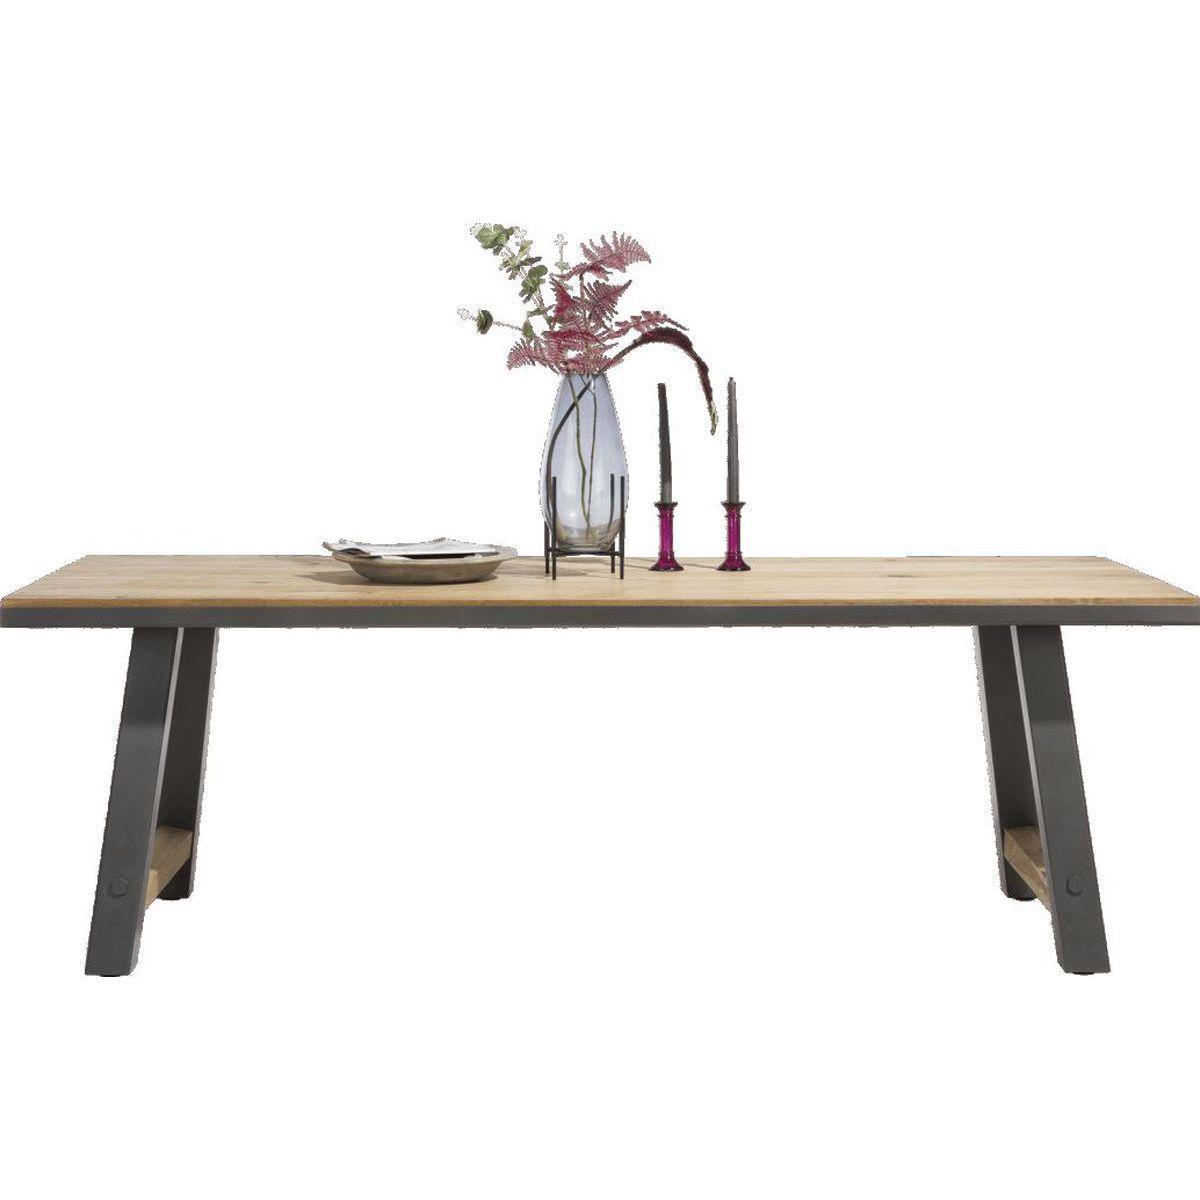 Table rectangulaire FARMLAND Henders & Hazel 180 x 100cm